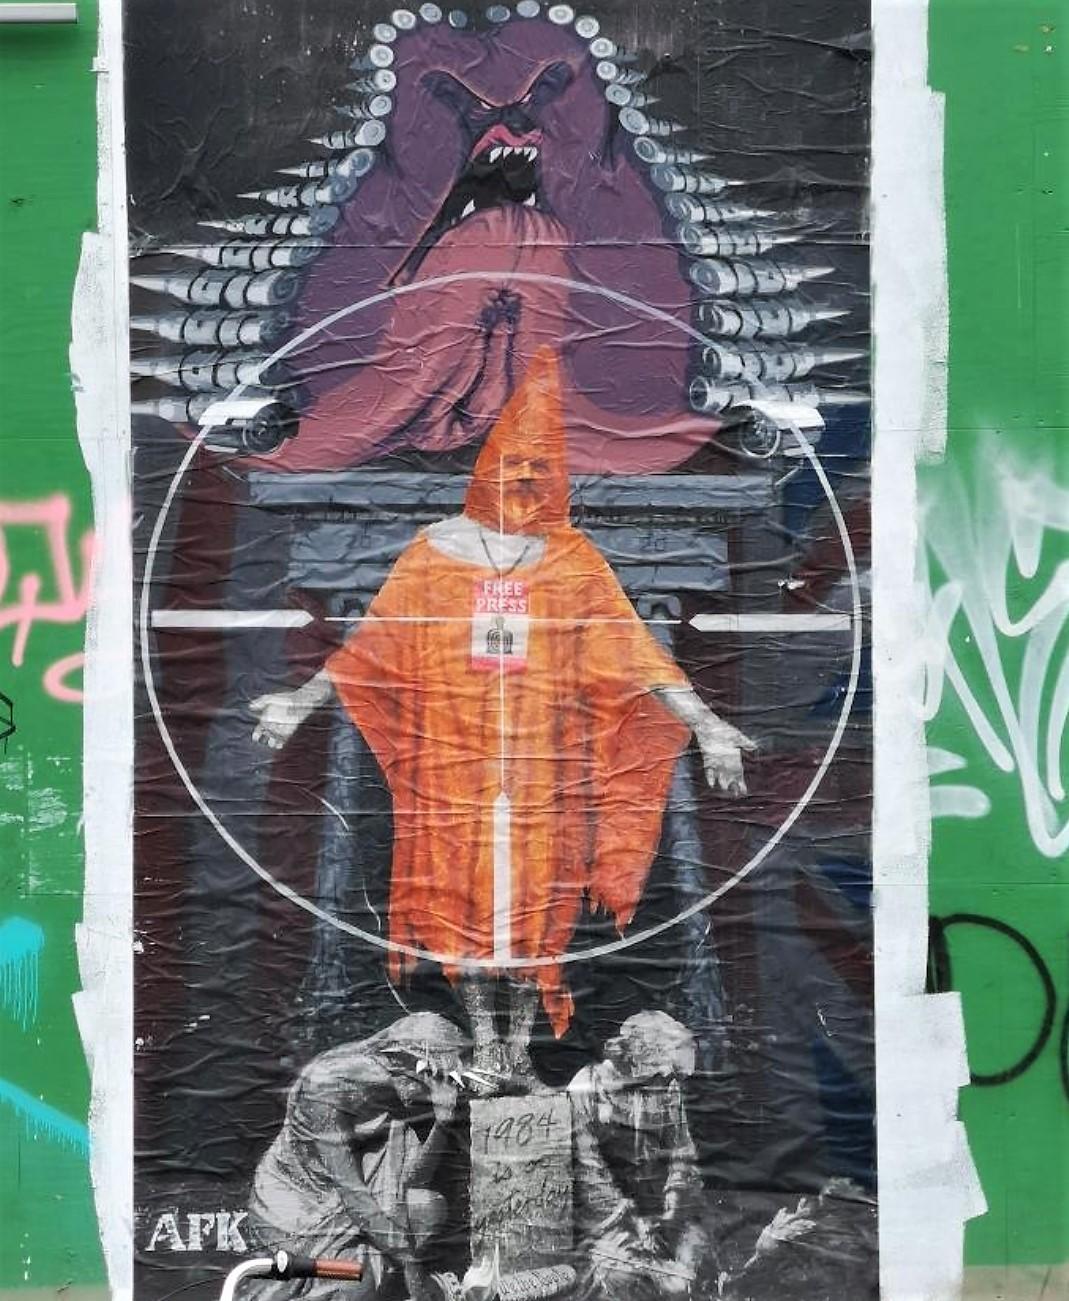 AFK Street art